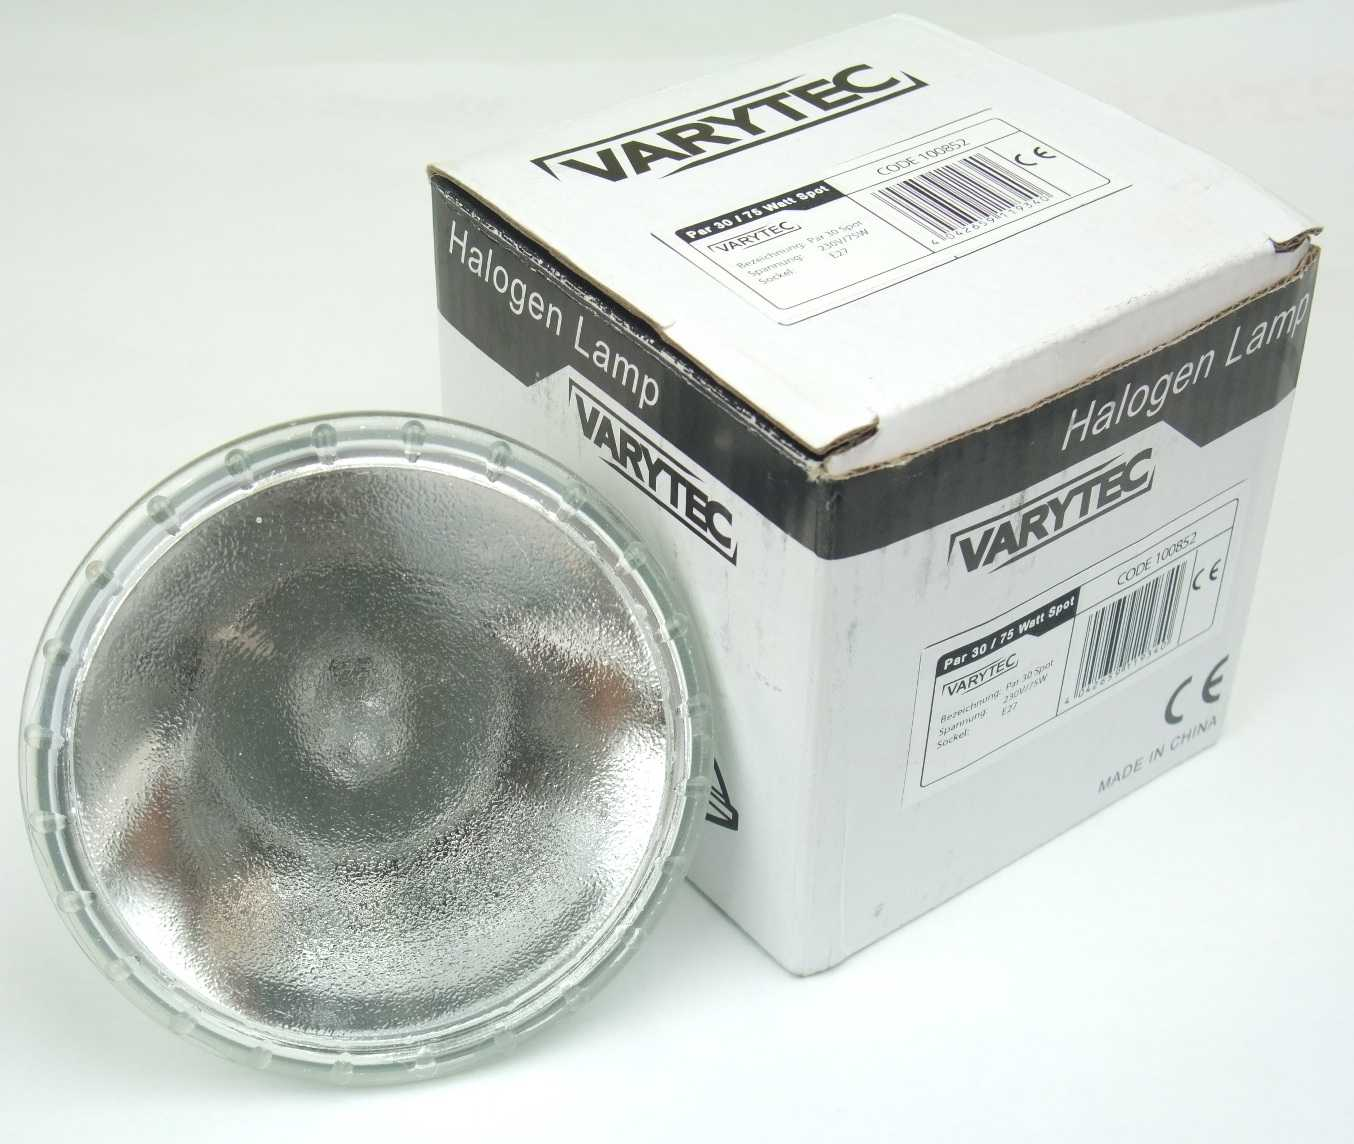 75 W PAR 30 Leuchtmittel für E27 Fassung 10° Spot Lampe PAR-30 VARYTEC 230 V